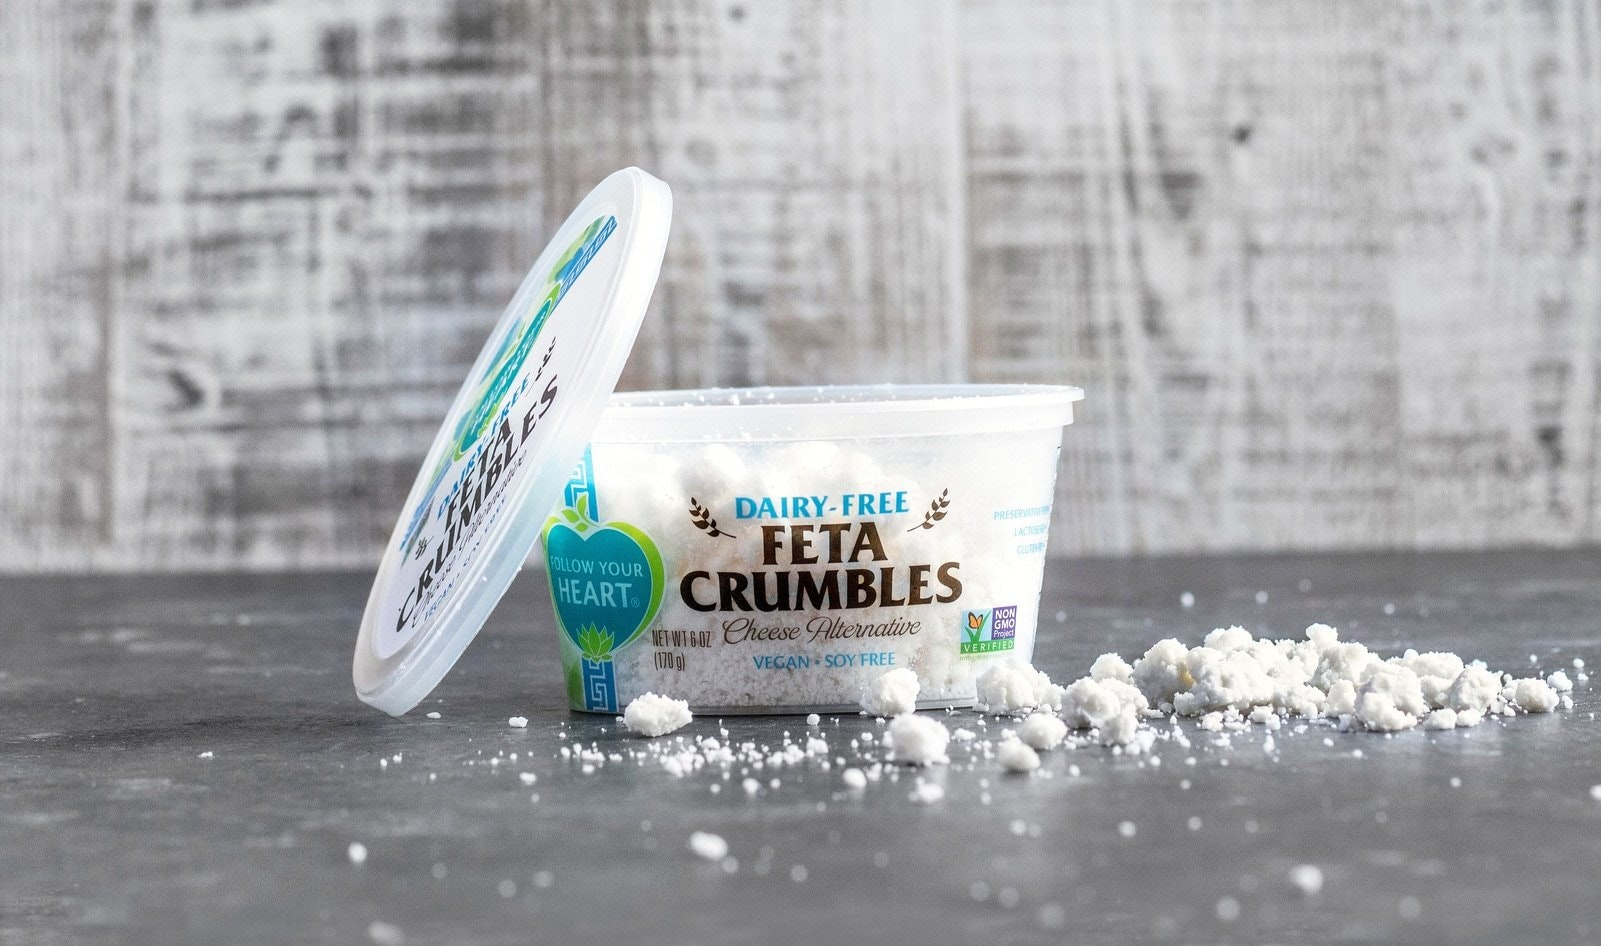 Follow Your Heart Dairy-Free Feta Crumbles